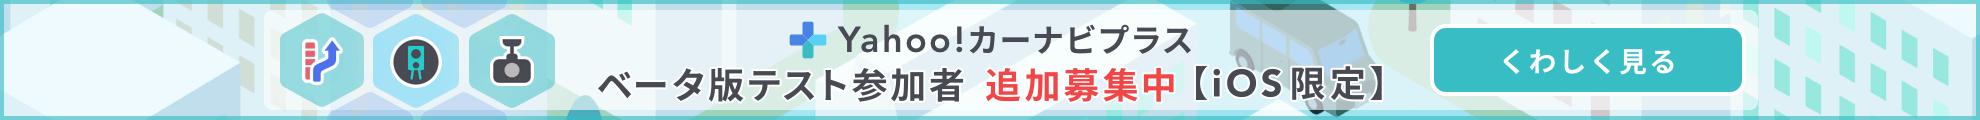 Yahoo!カーナビプラス ベータ版テスト参加者募集中【iOS限定】